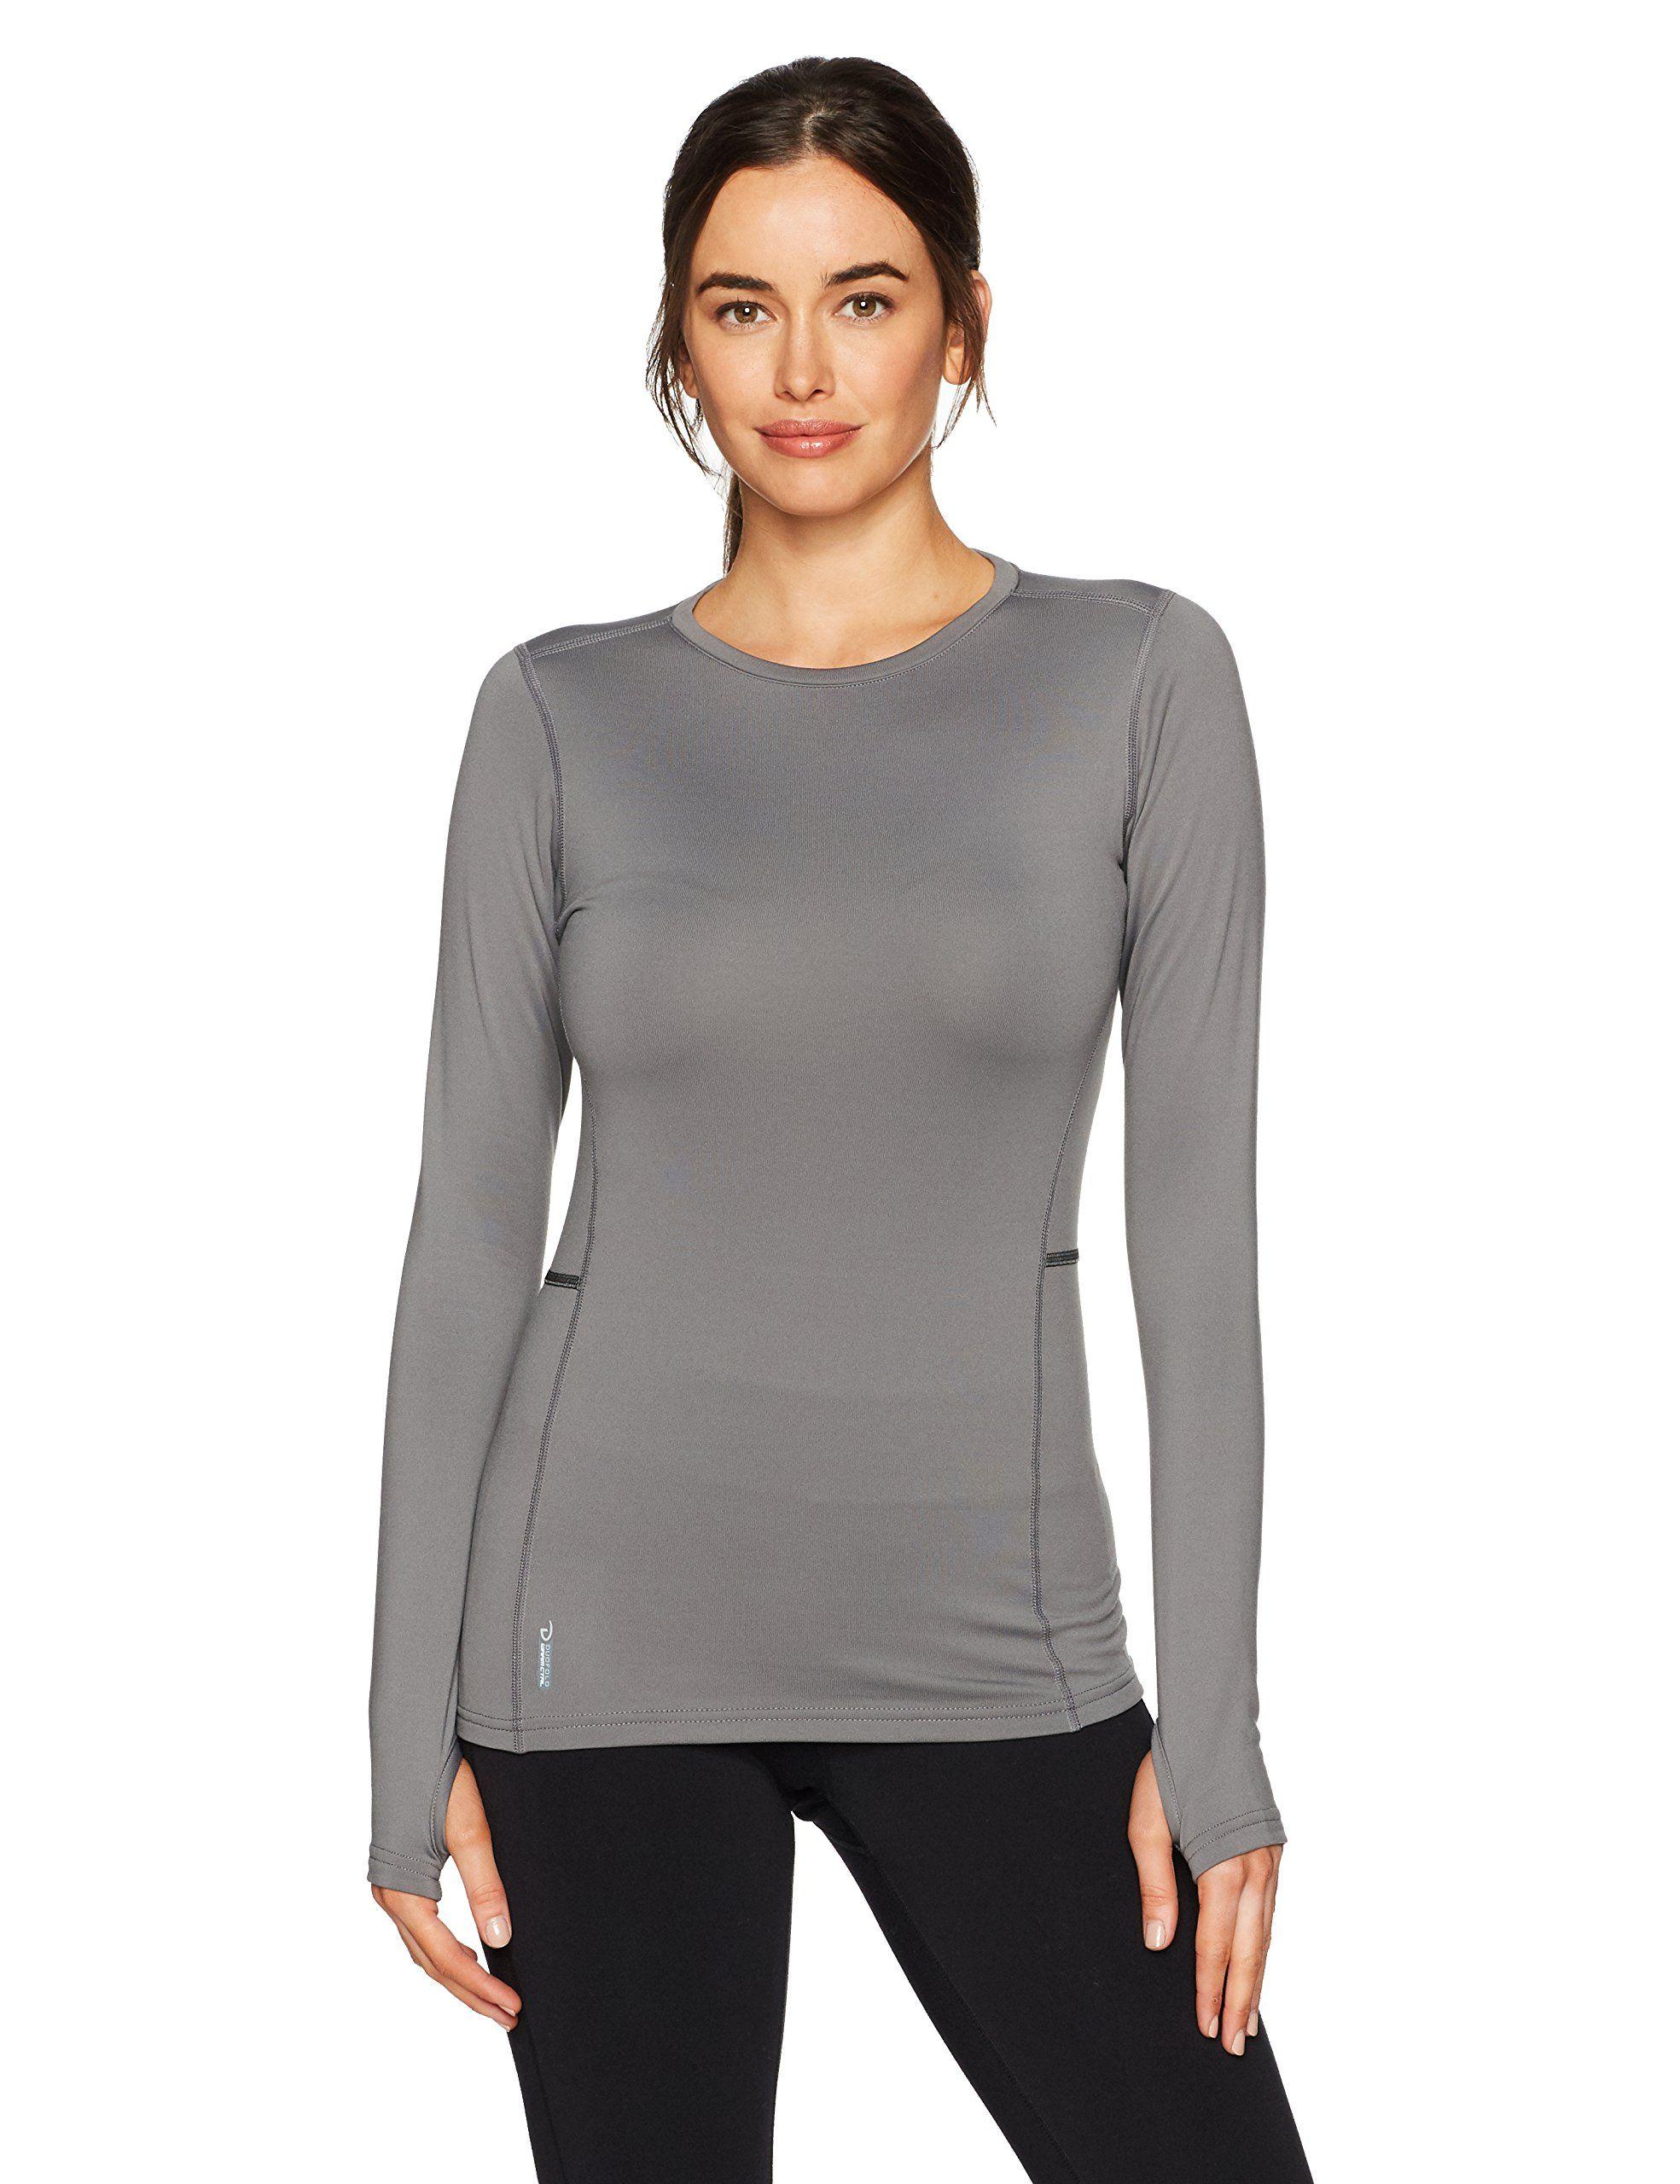 311d64985b4b Duofold Women's Mid Weight Fleece Lined Thermal Shirt, Thundering Gray,  Medium. X-